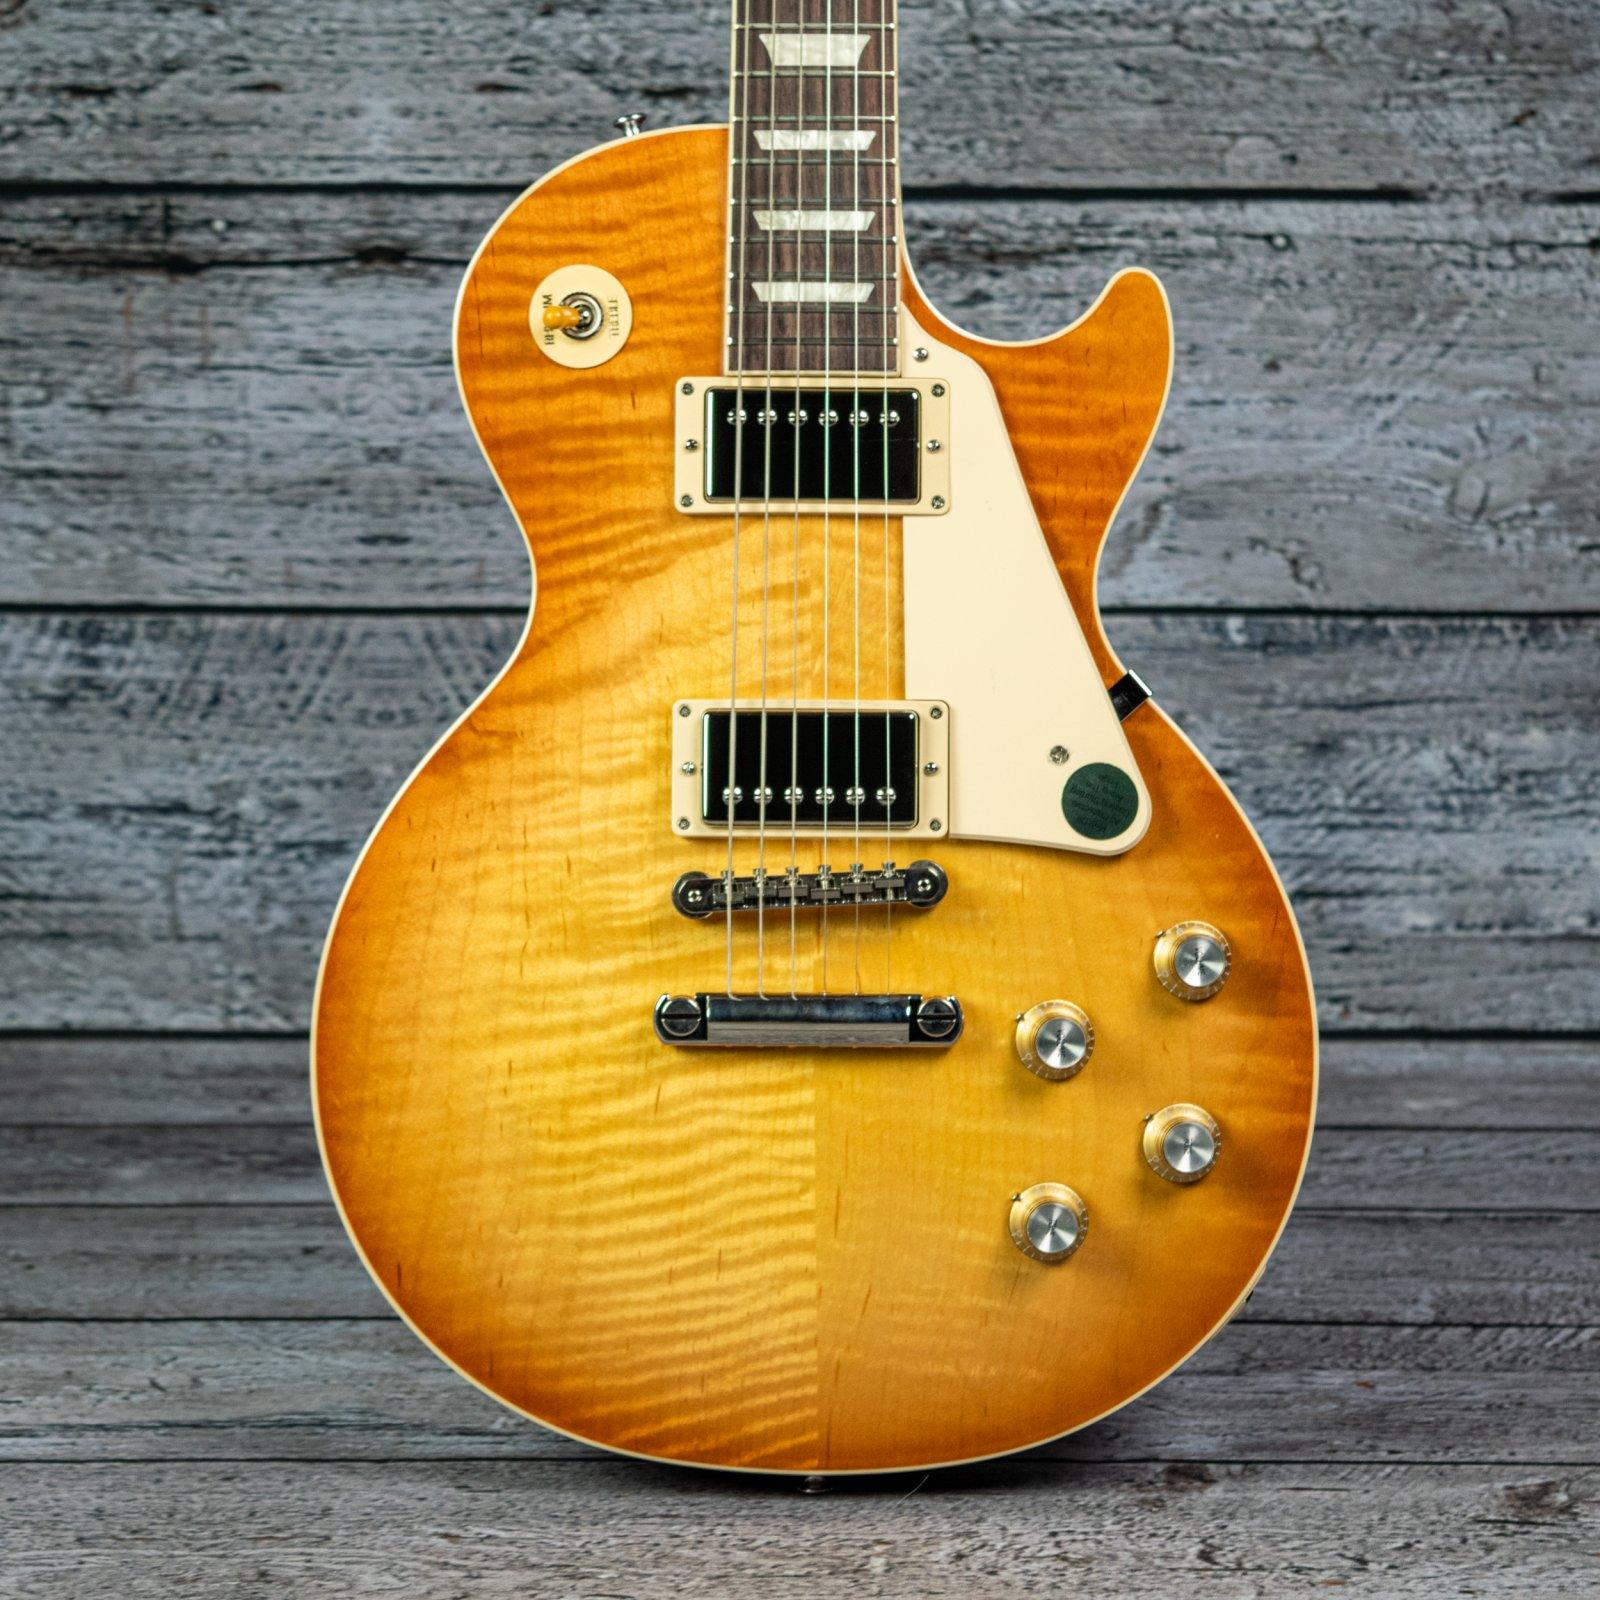 Gibson Les Paul Standard '60s Figured Top - Unburst (Serial: 234200131)